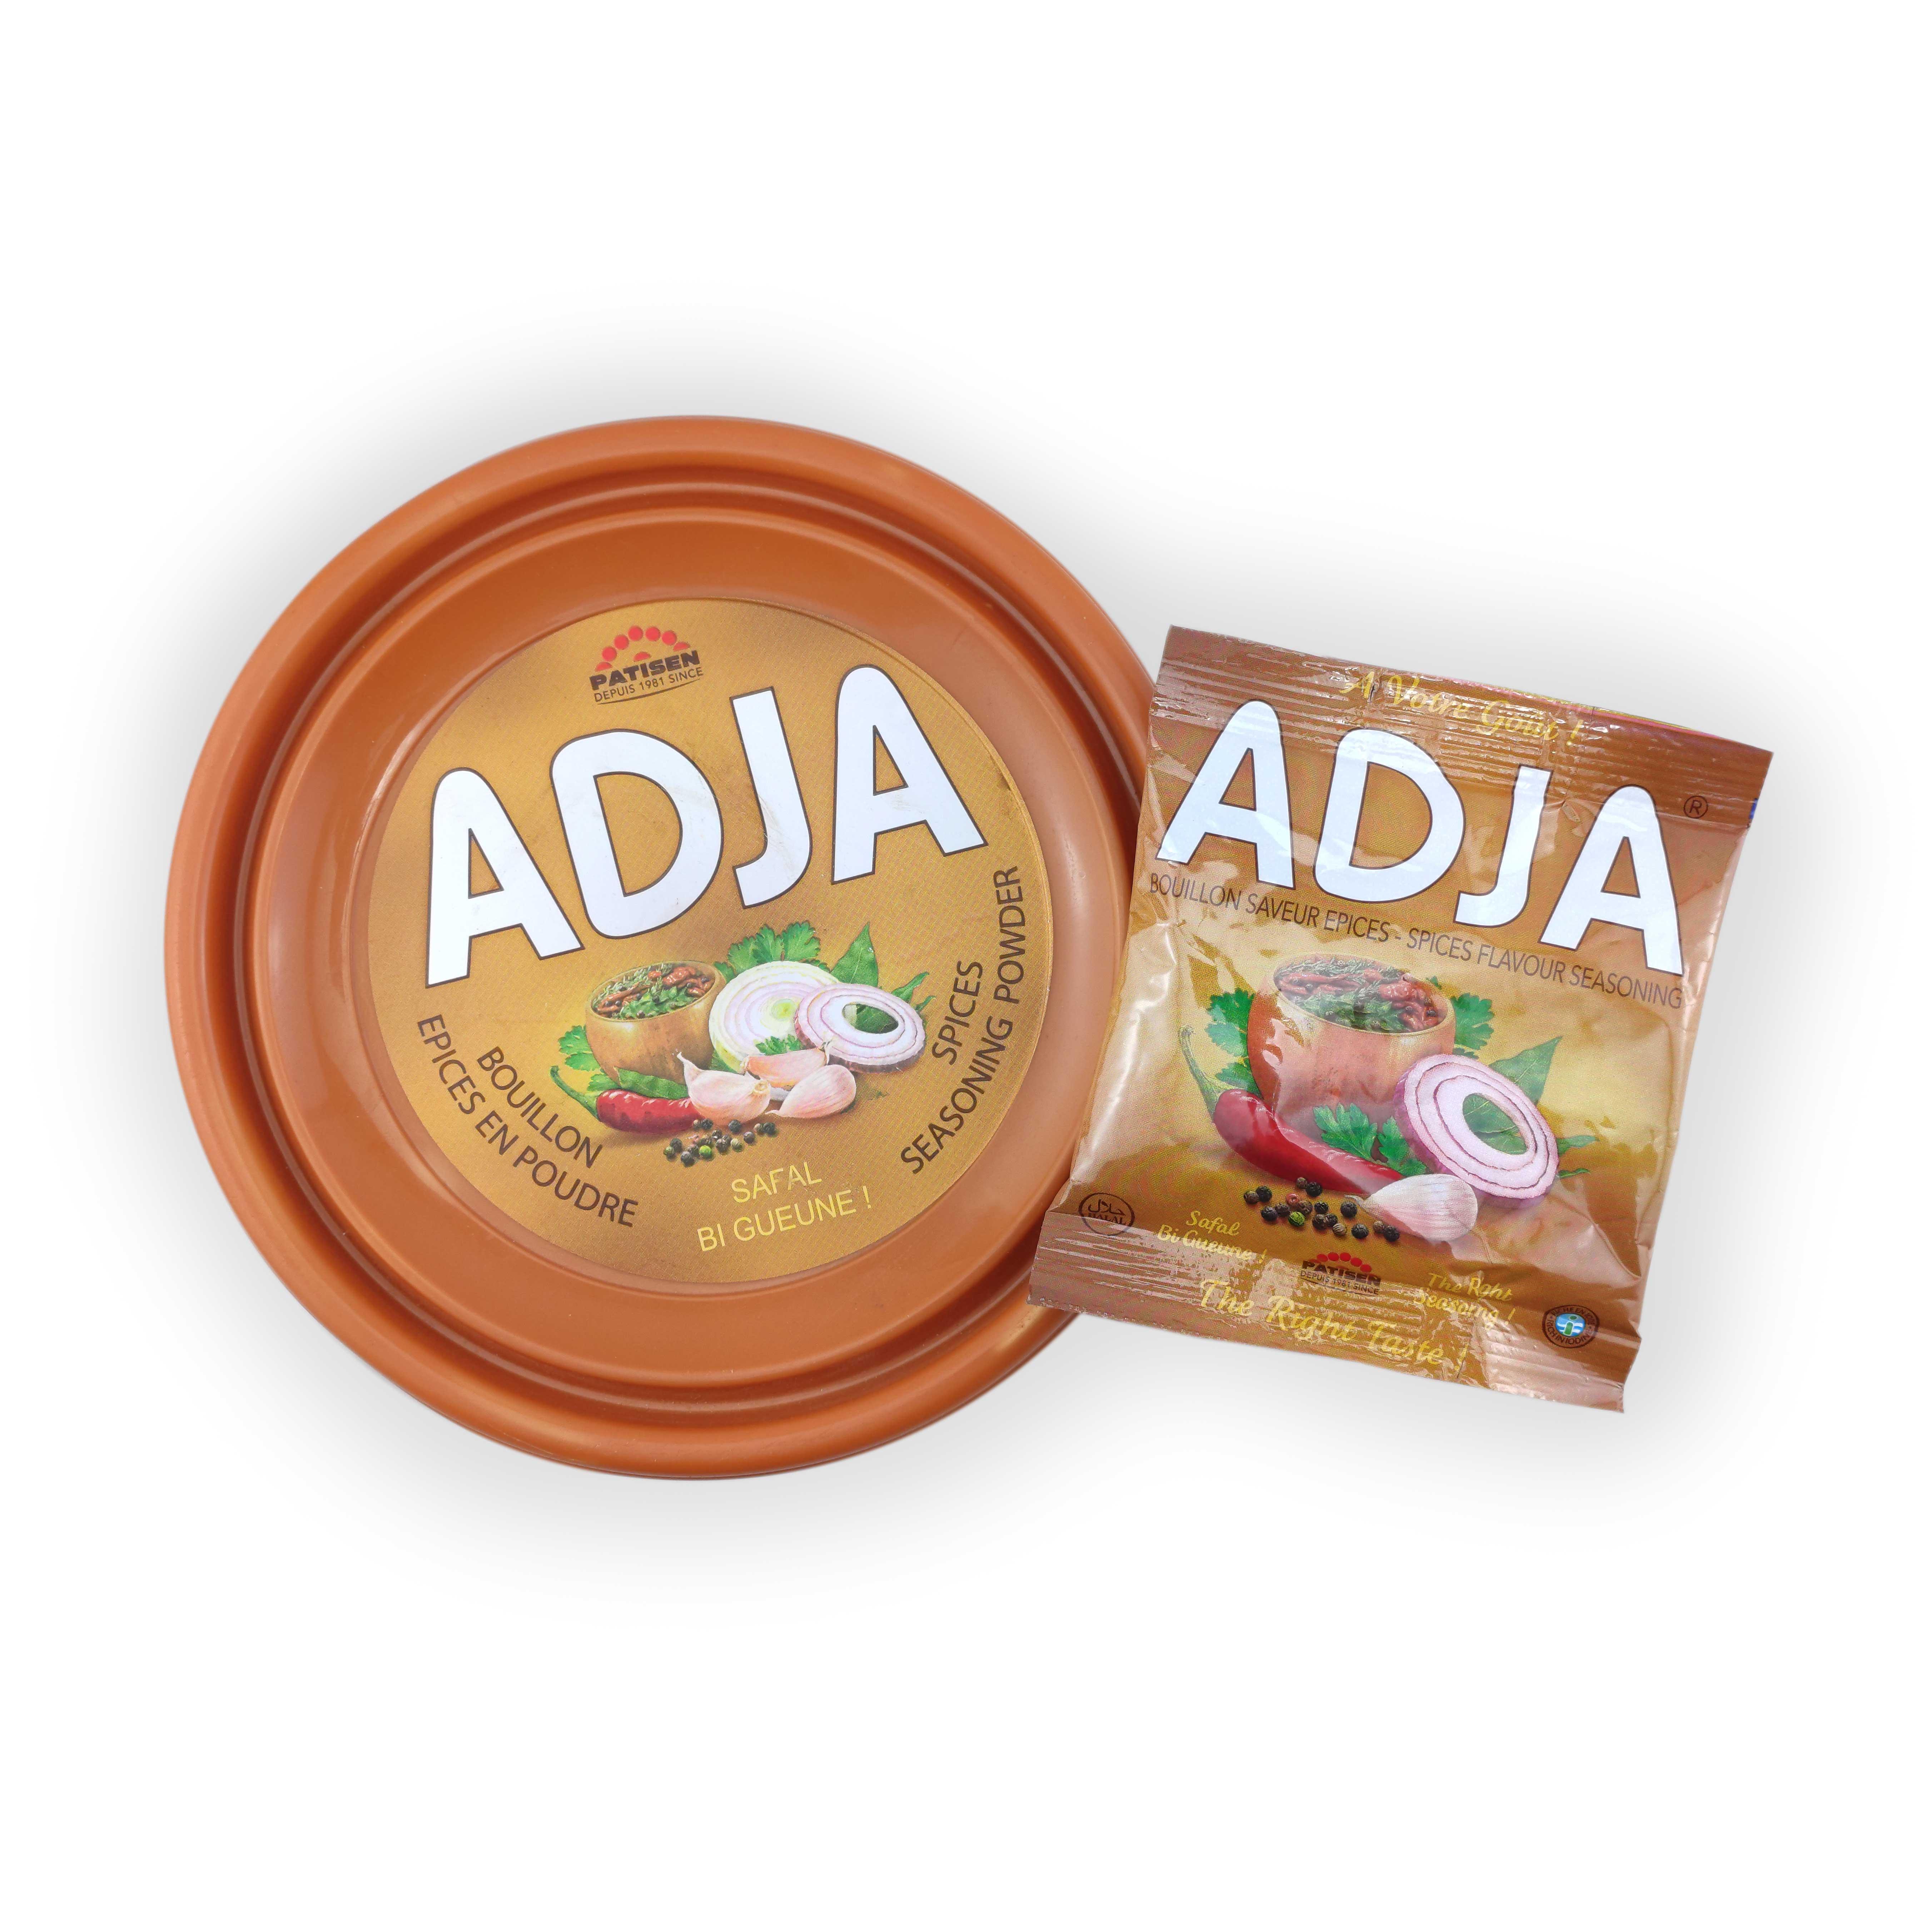 adja-sachet-bol-patisens-1kg-site-web-moushenco